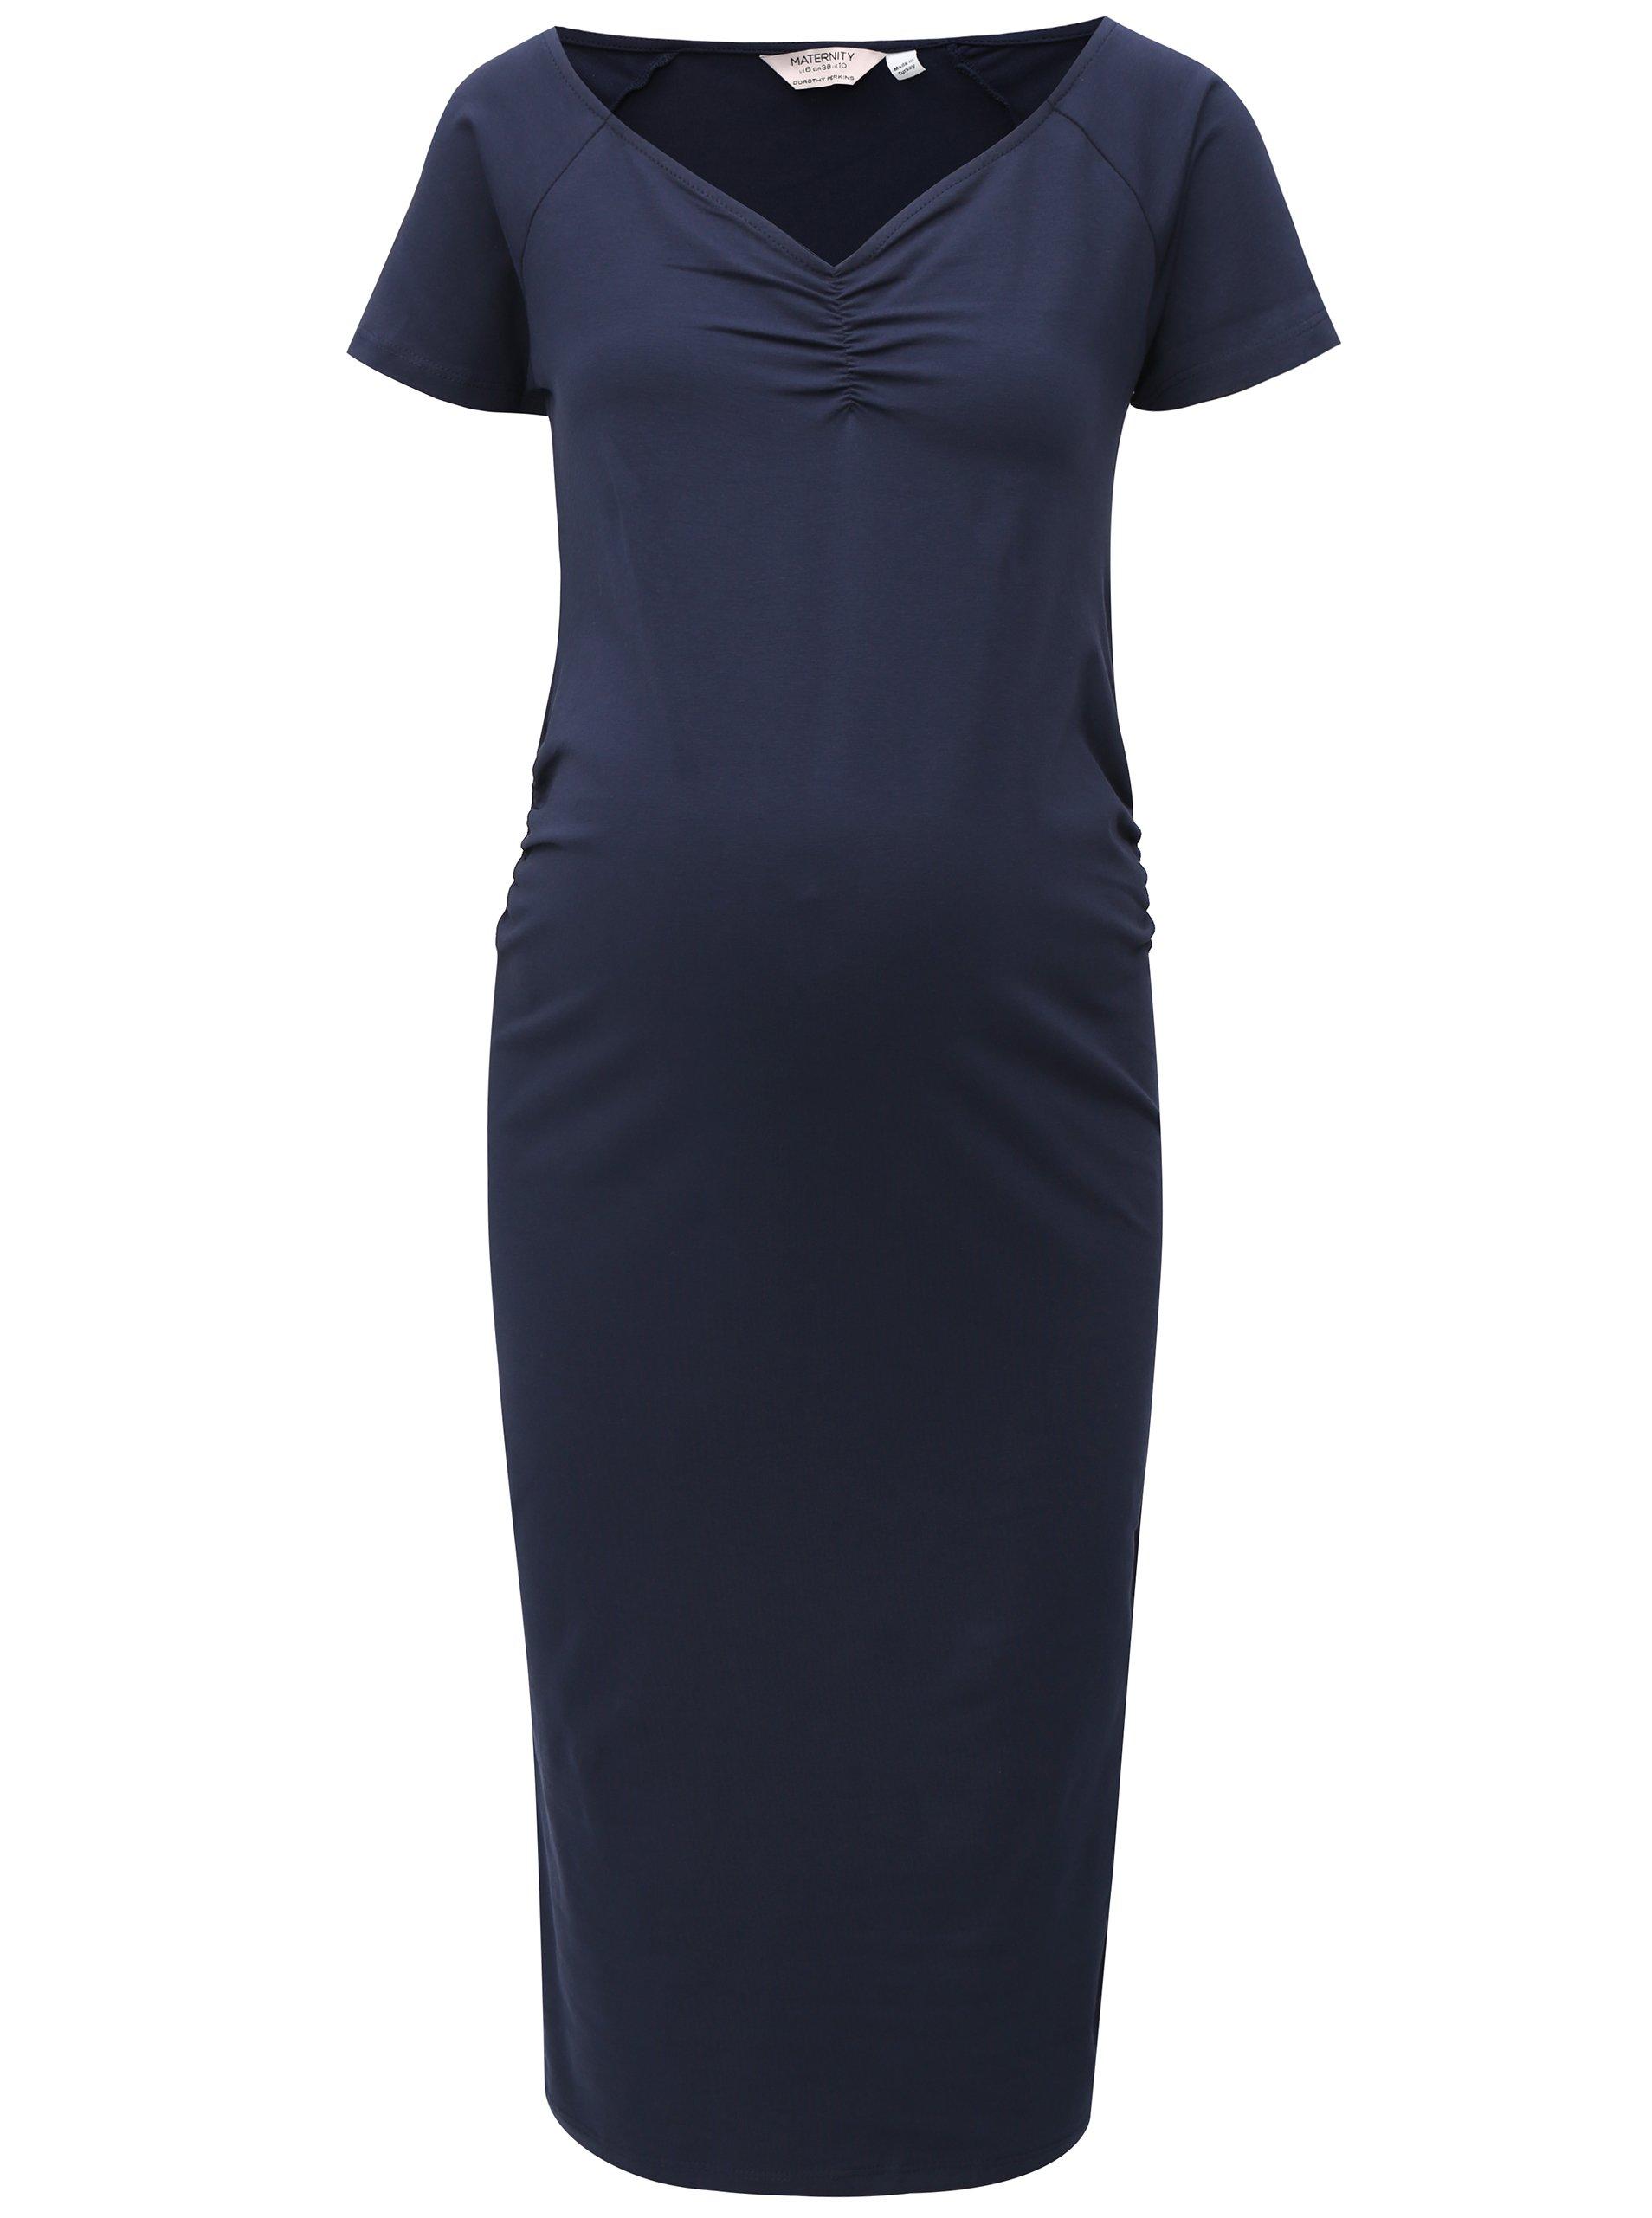 Tmavomodré puzdrové tehotenské šaty Dorothy Perkins Maternity 27bd70b41ff